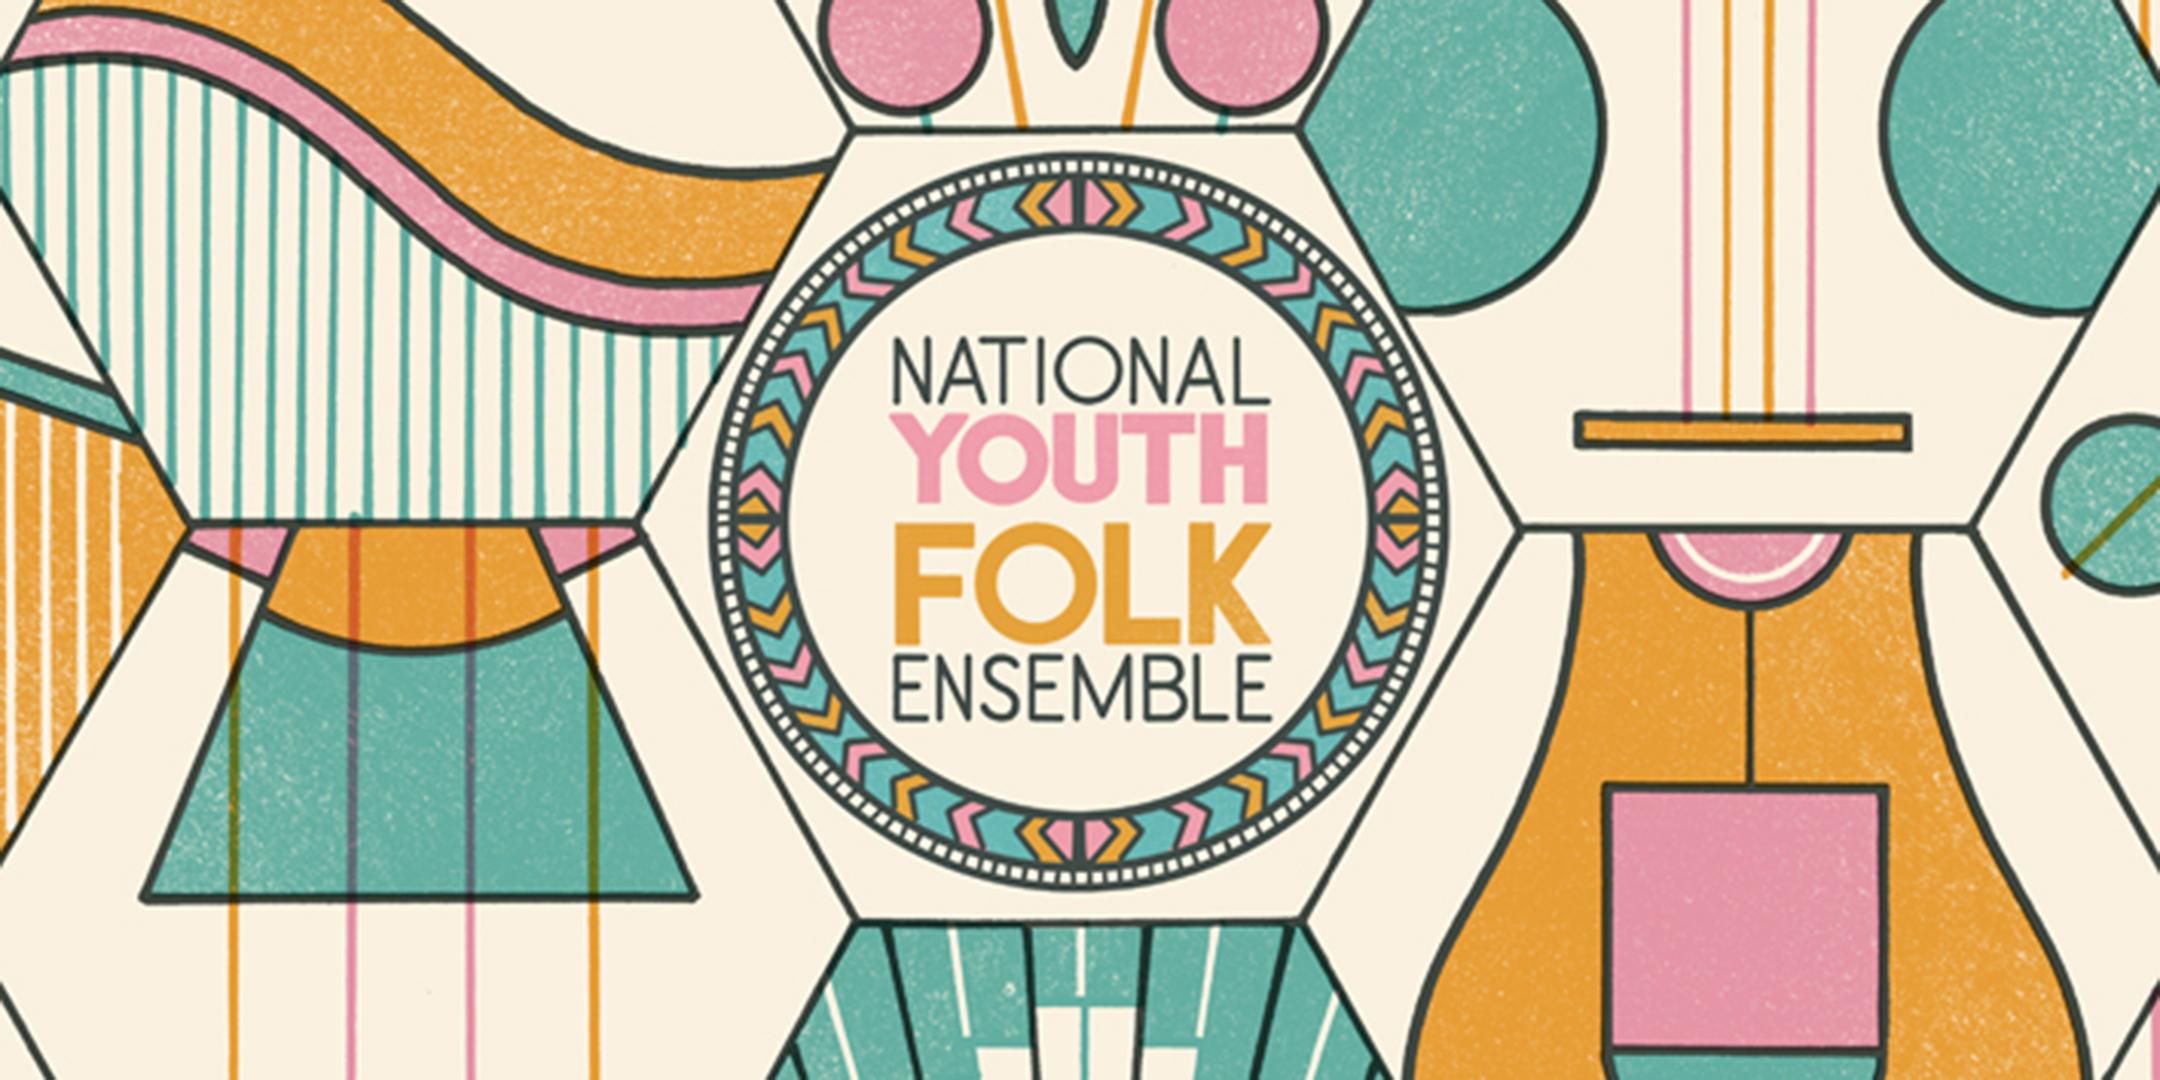 National Youth Folk Ensemble Sampler Day - SH